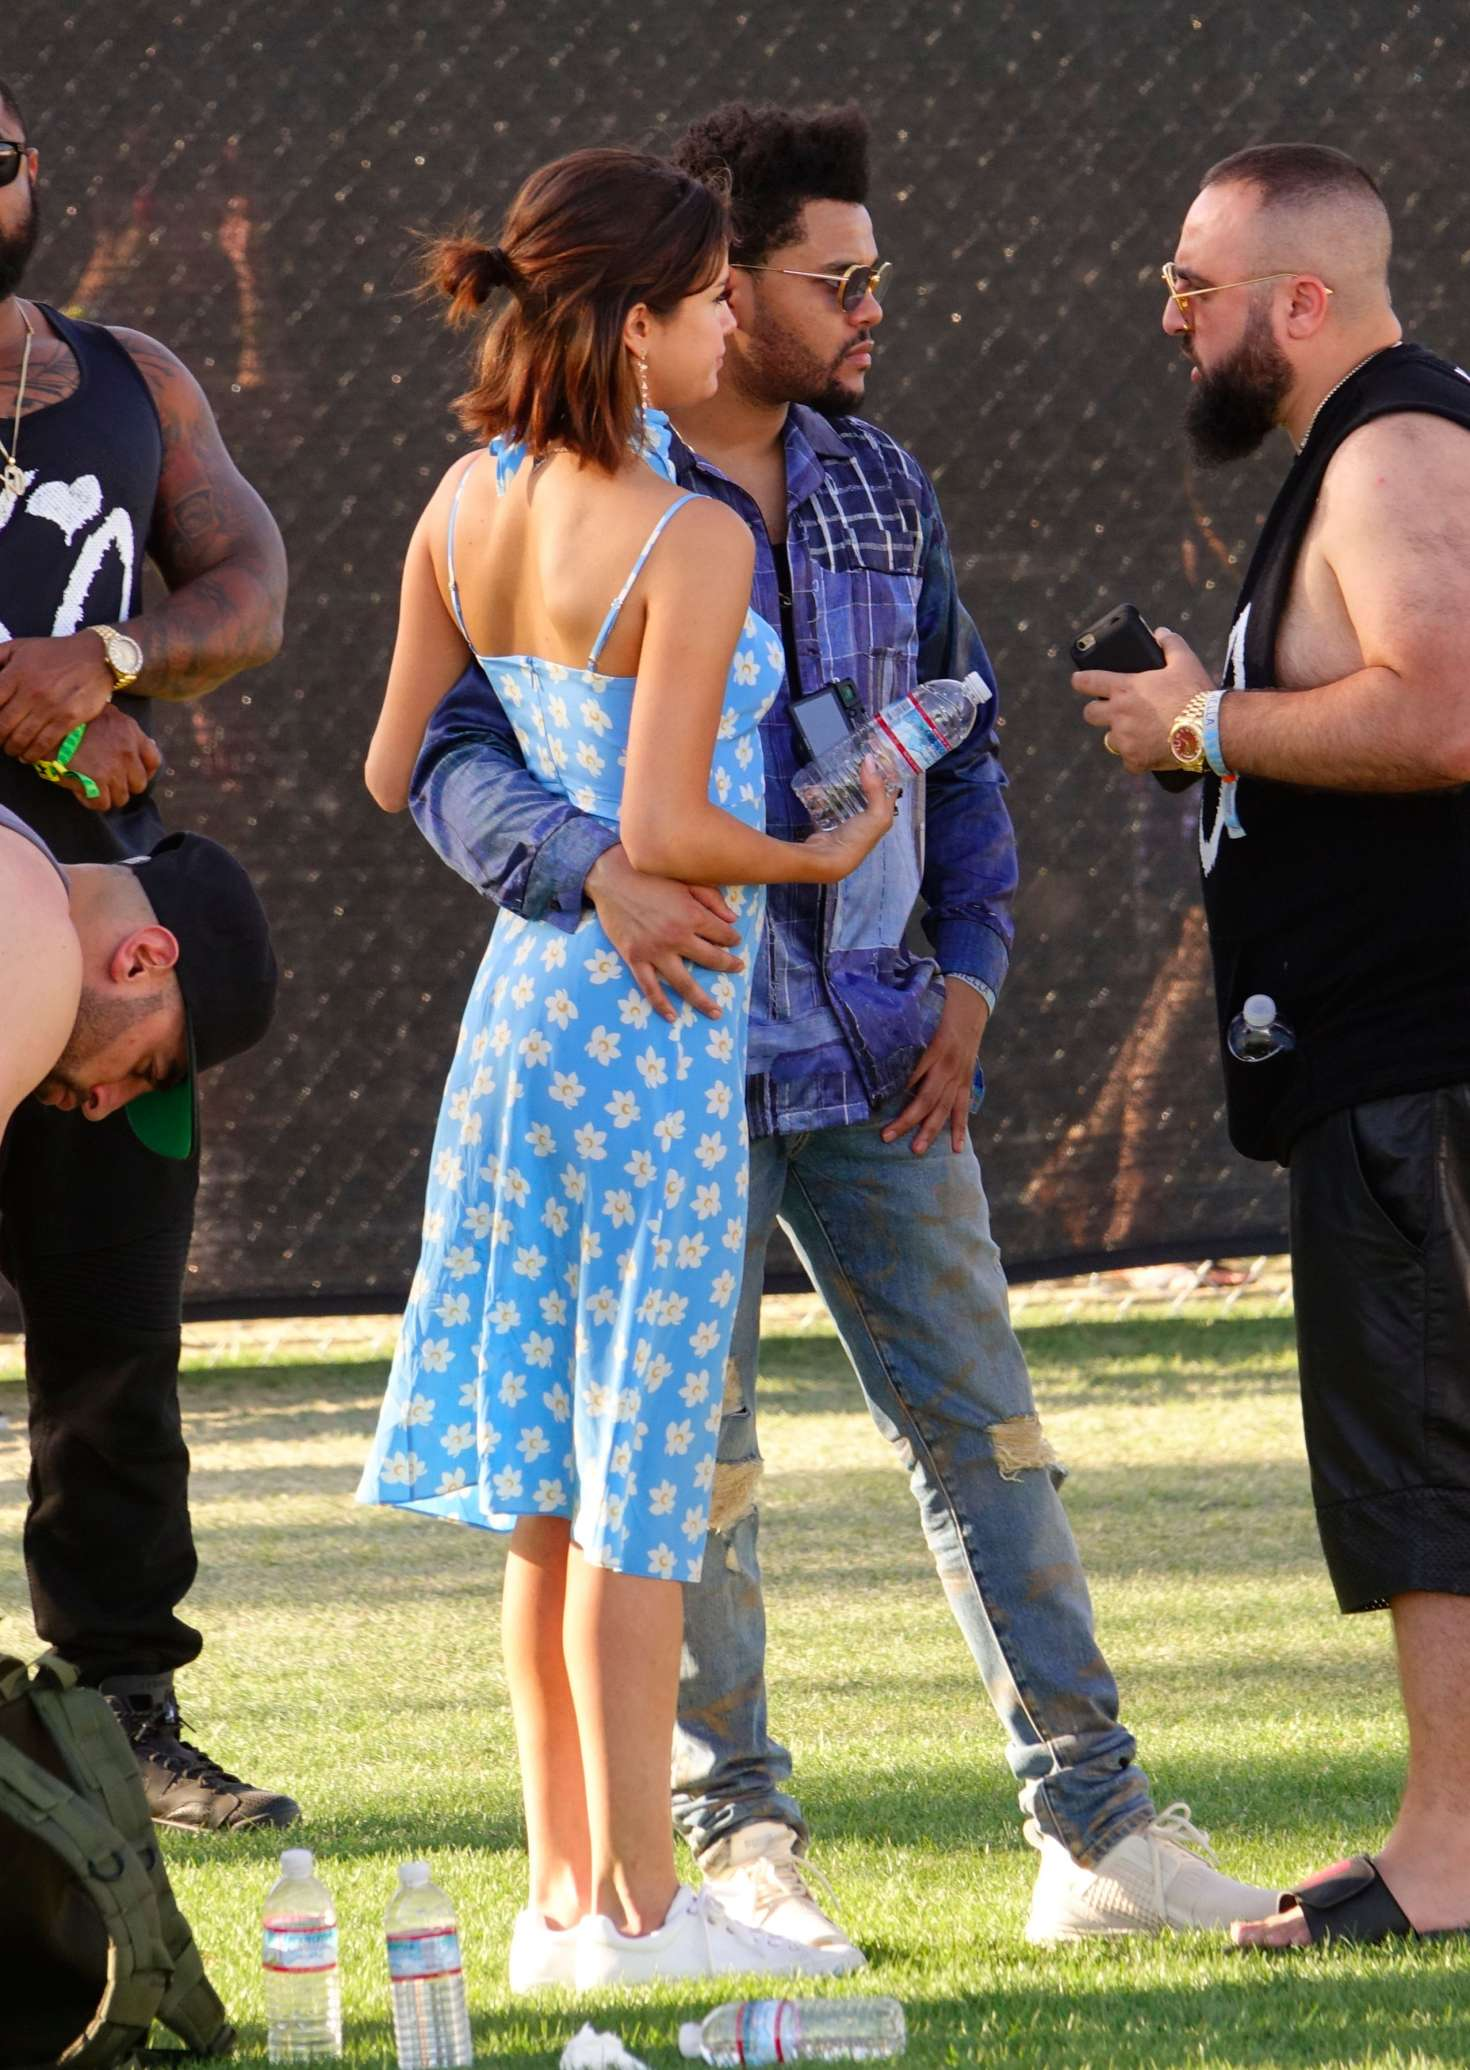 Selena Gomez and The Weeknd 2017 Coachella Music Festival 1470x2070